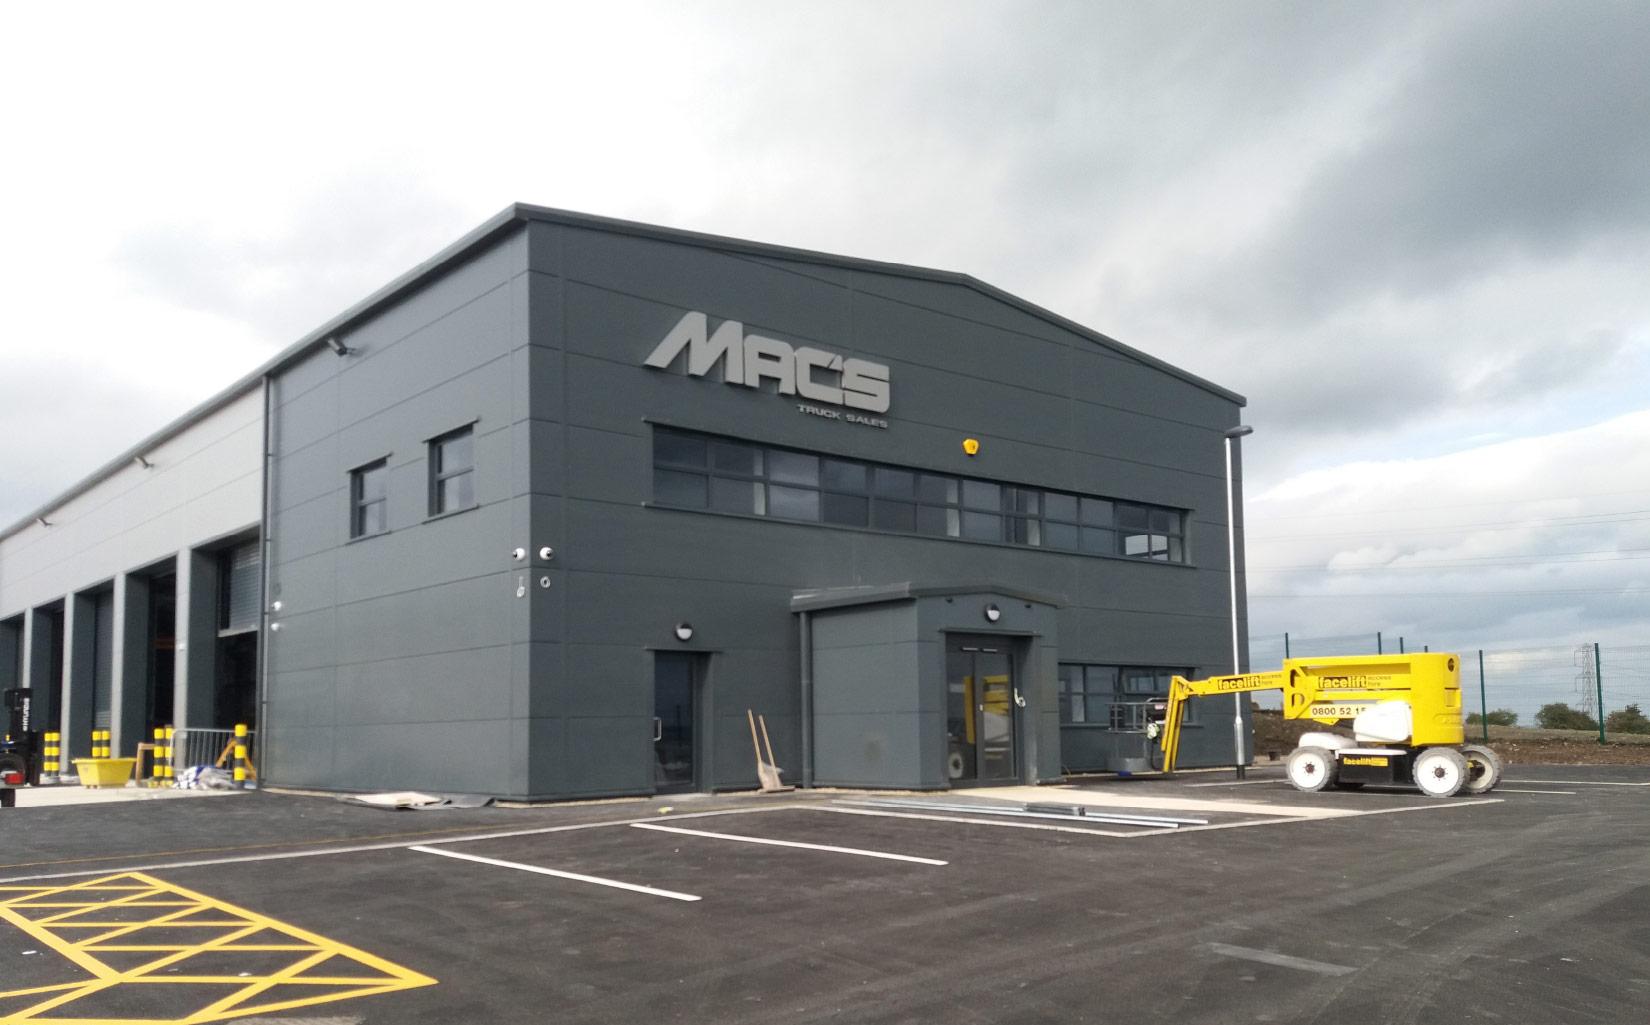 Macs Trucks, Lindley Moor, Huddersfield, Onsite